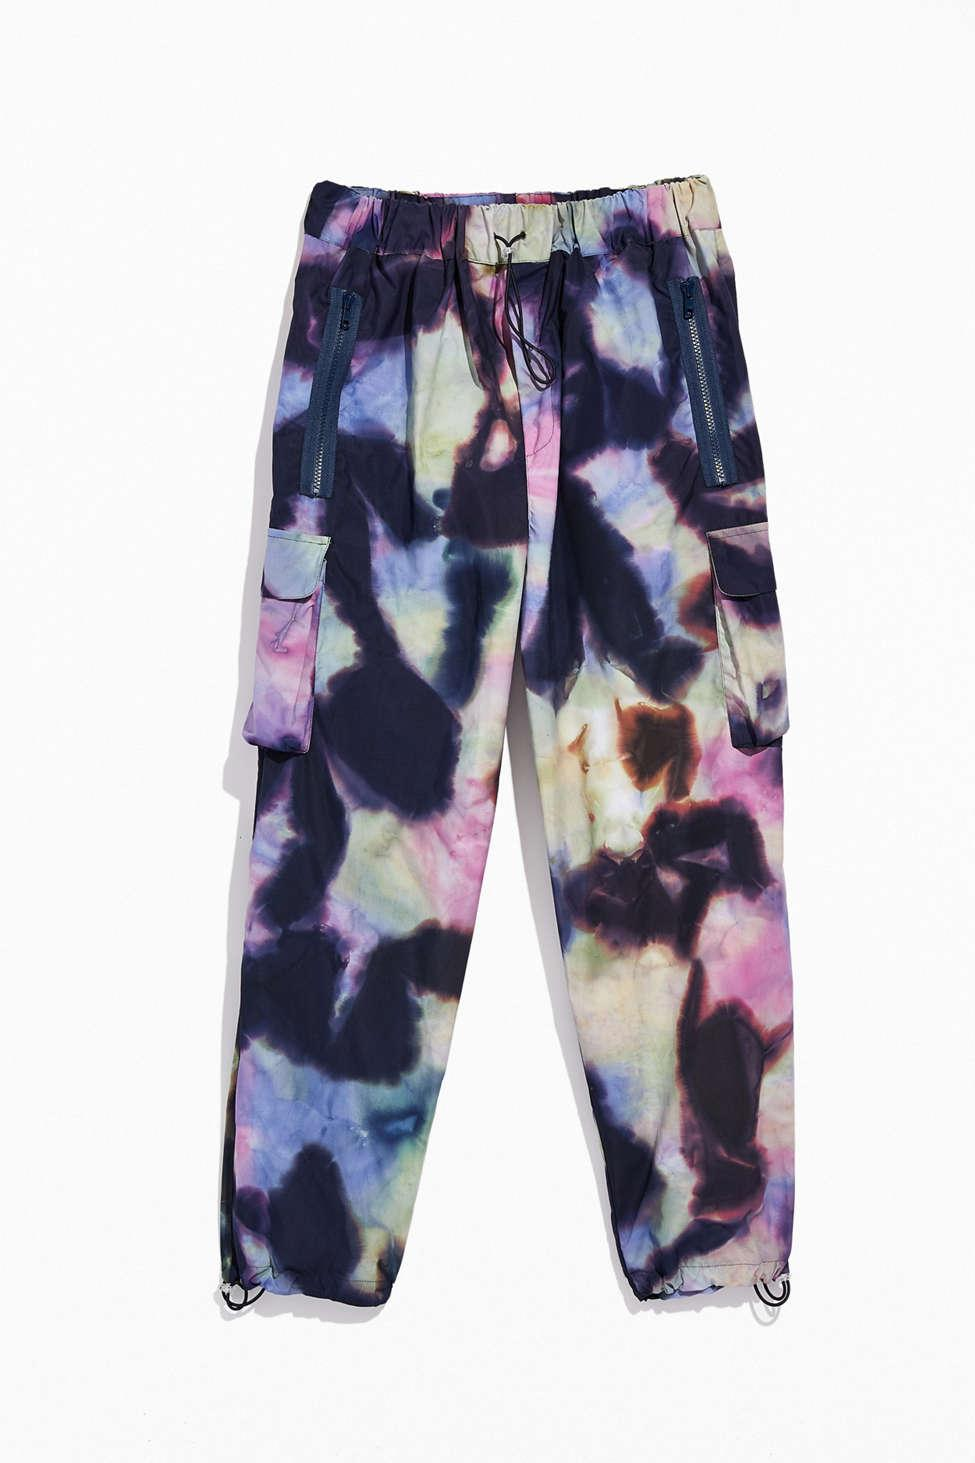 Tie-Dye drawstring Shorts  Wind  black /& grey